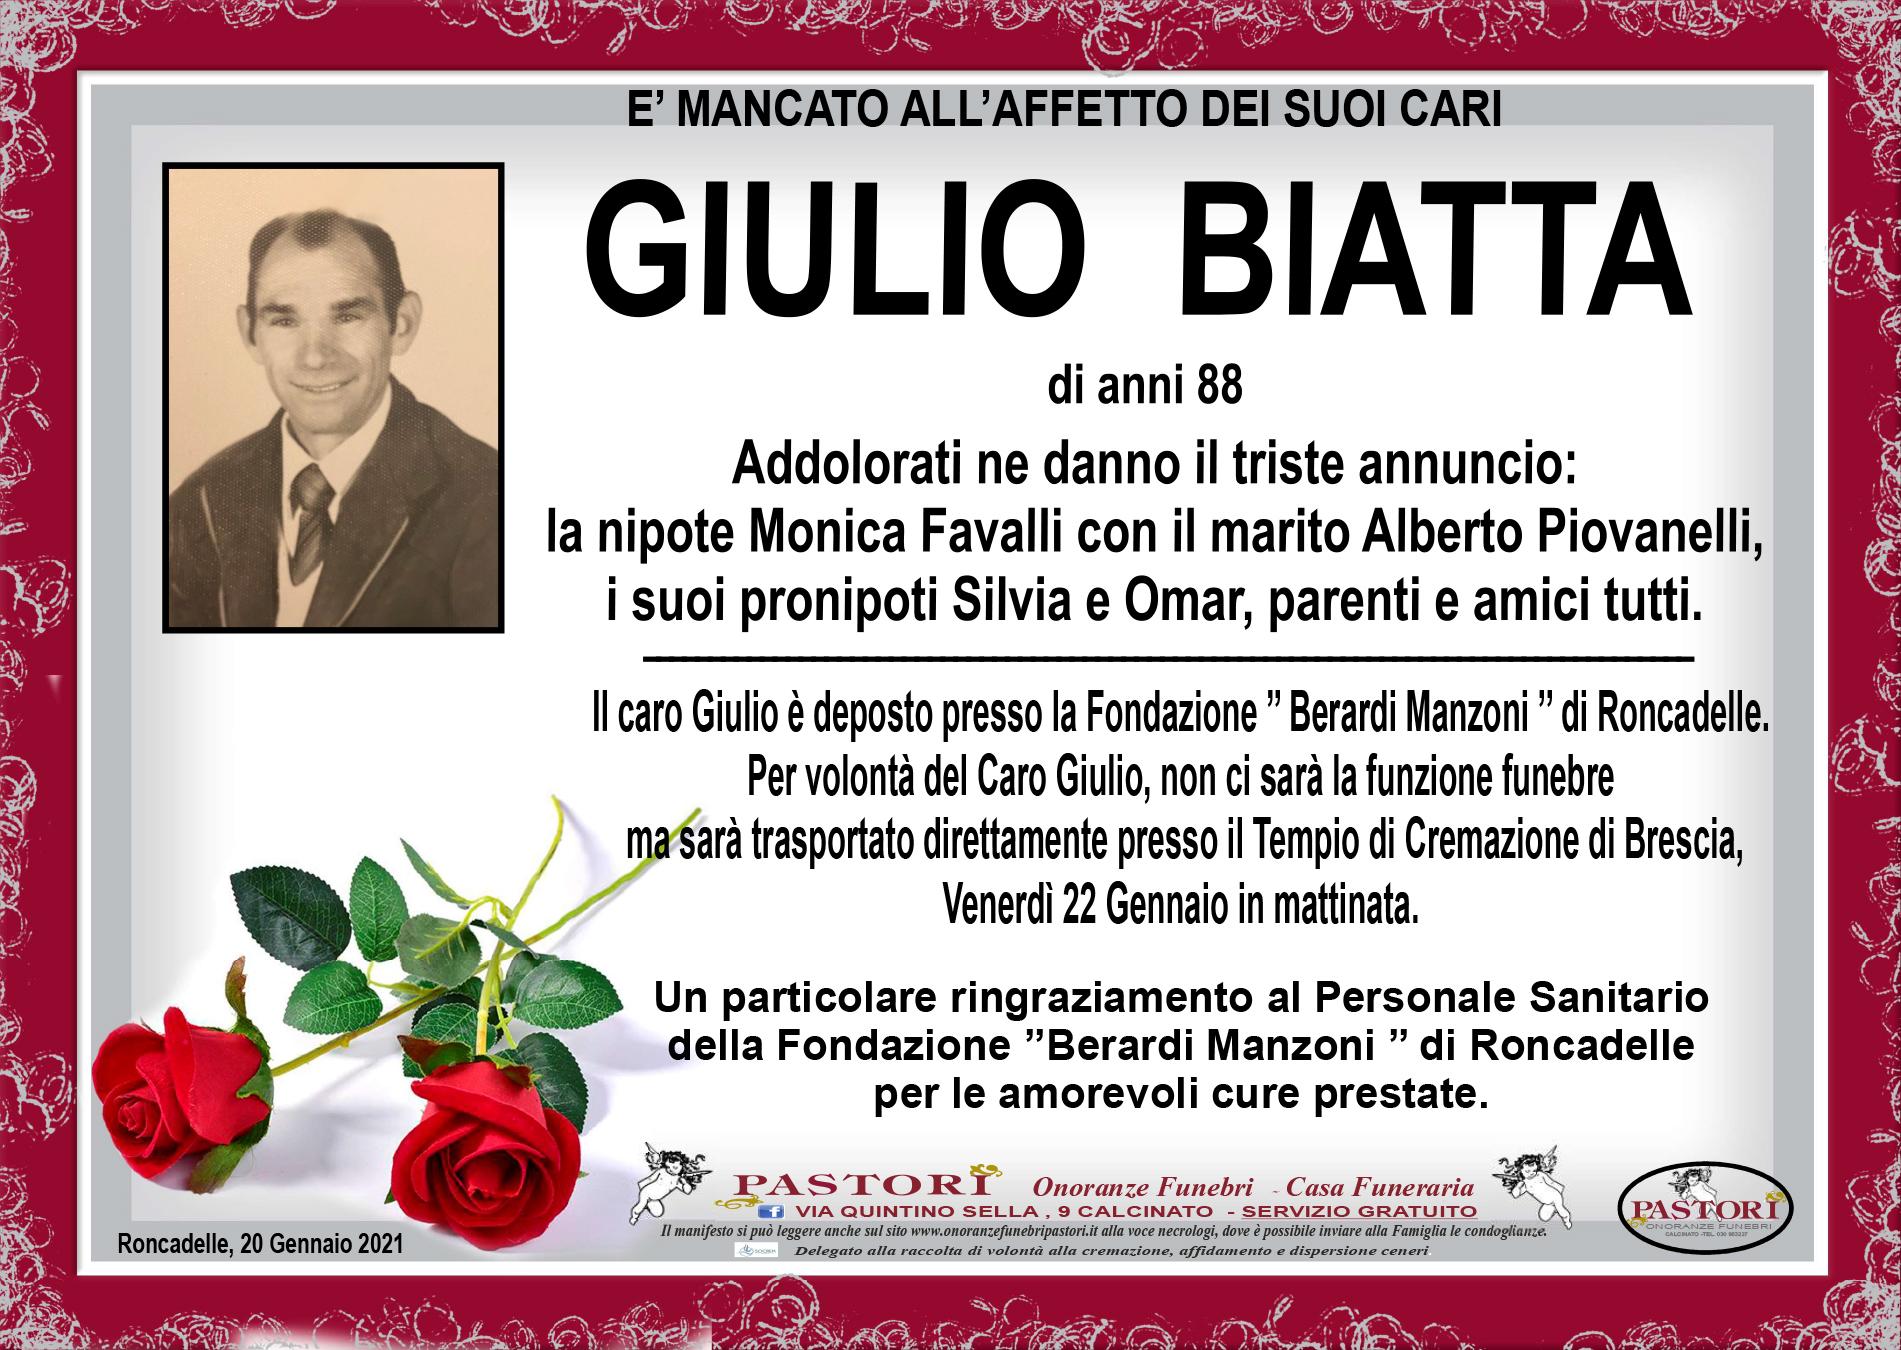 Giulio Biatta